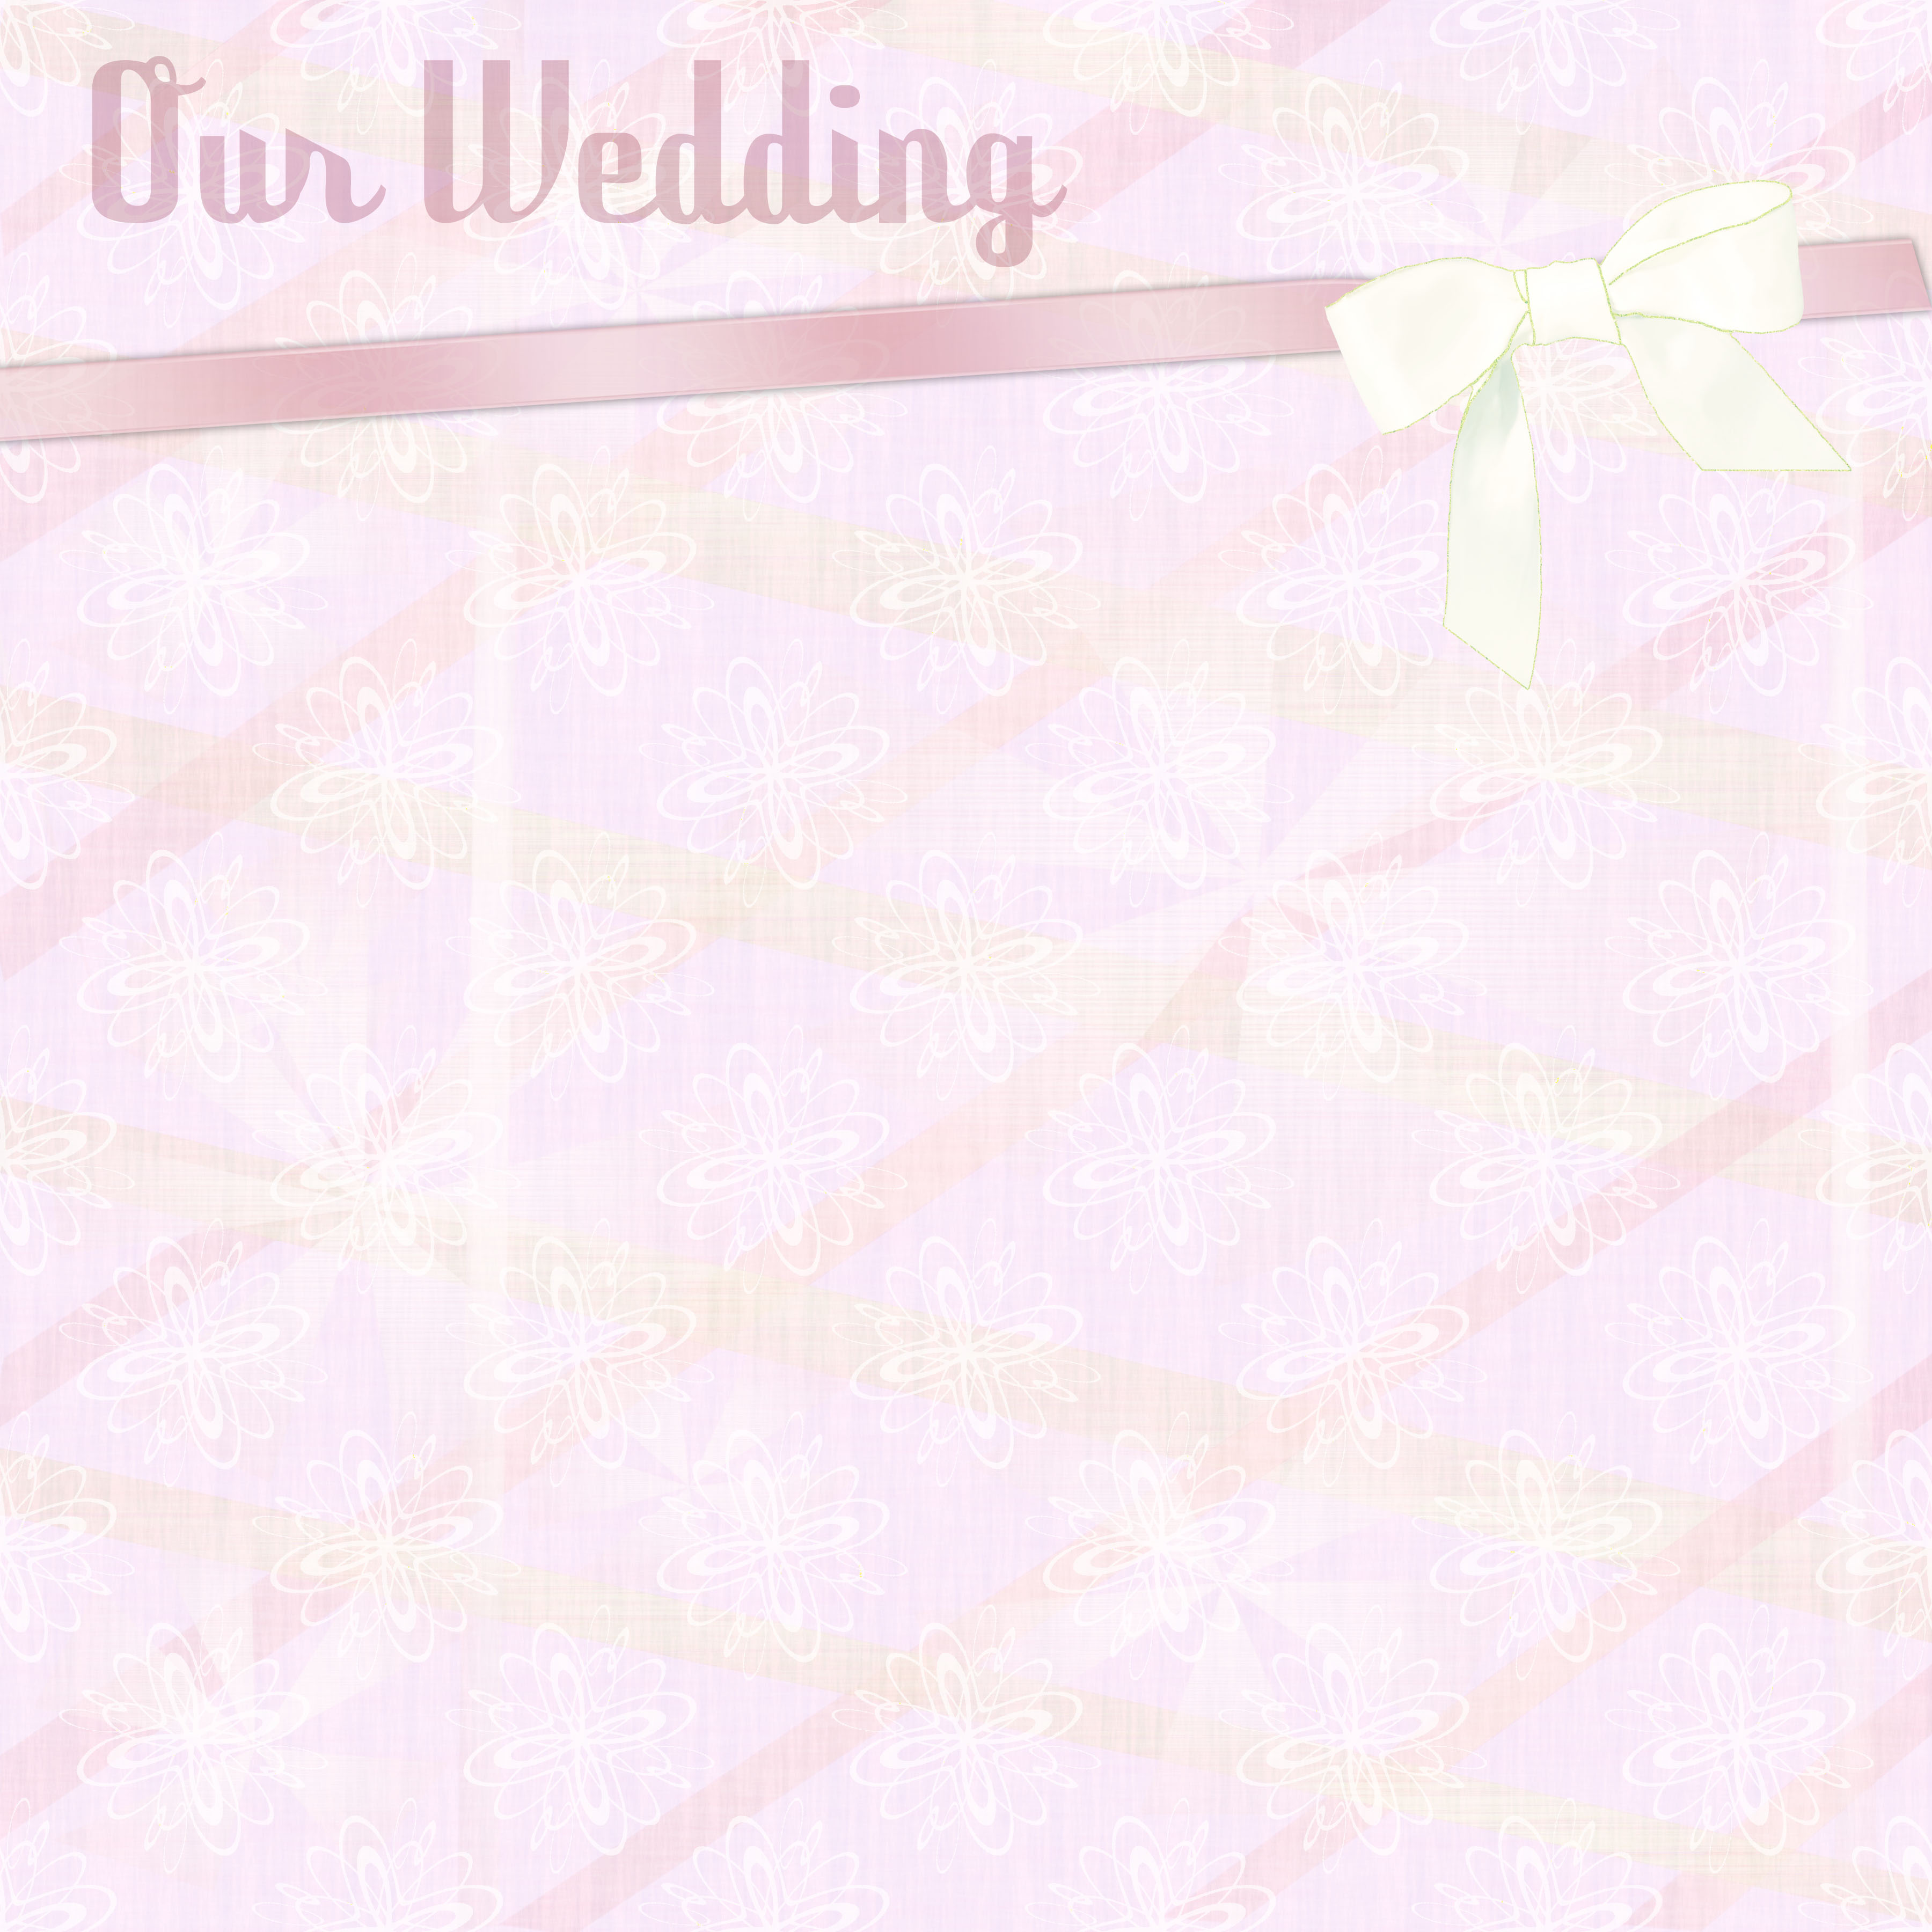 Wedding Wallpaper at 1280x1024 3600x3600